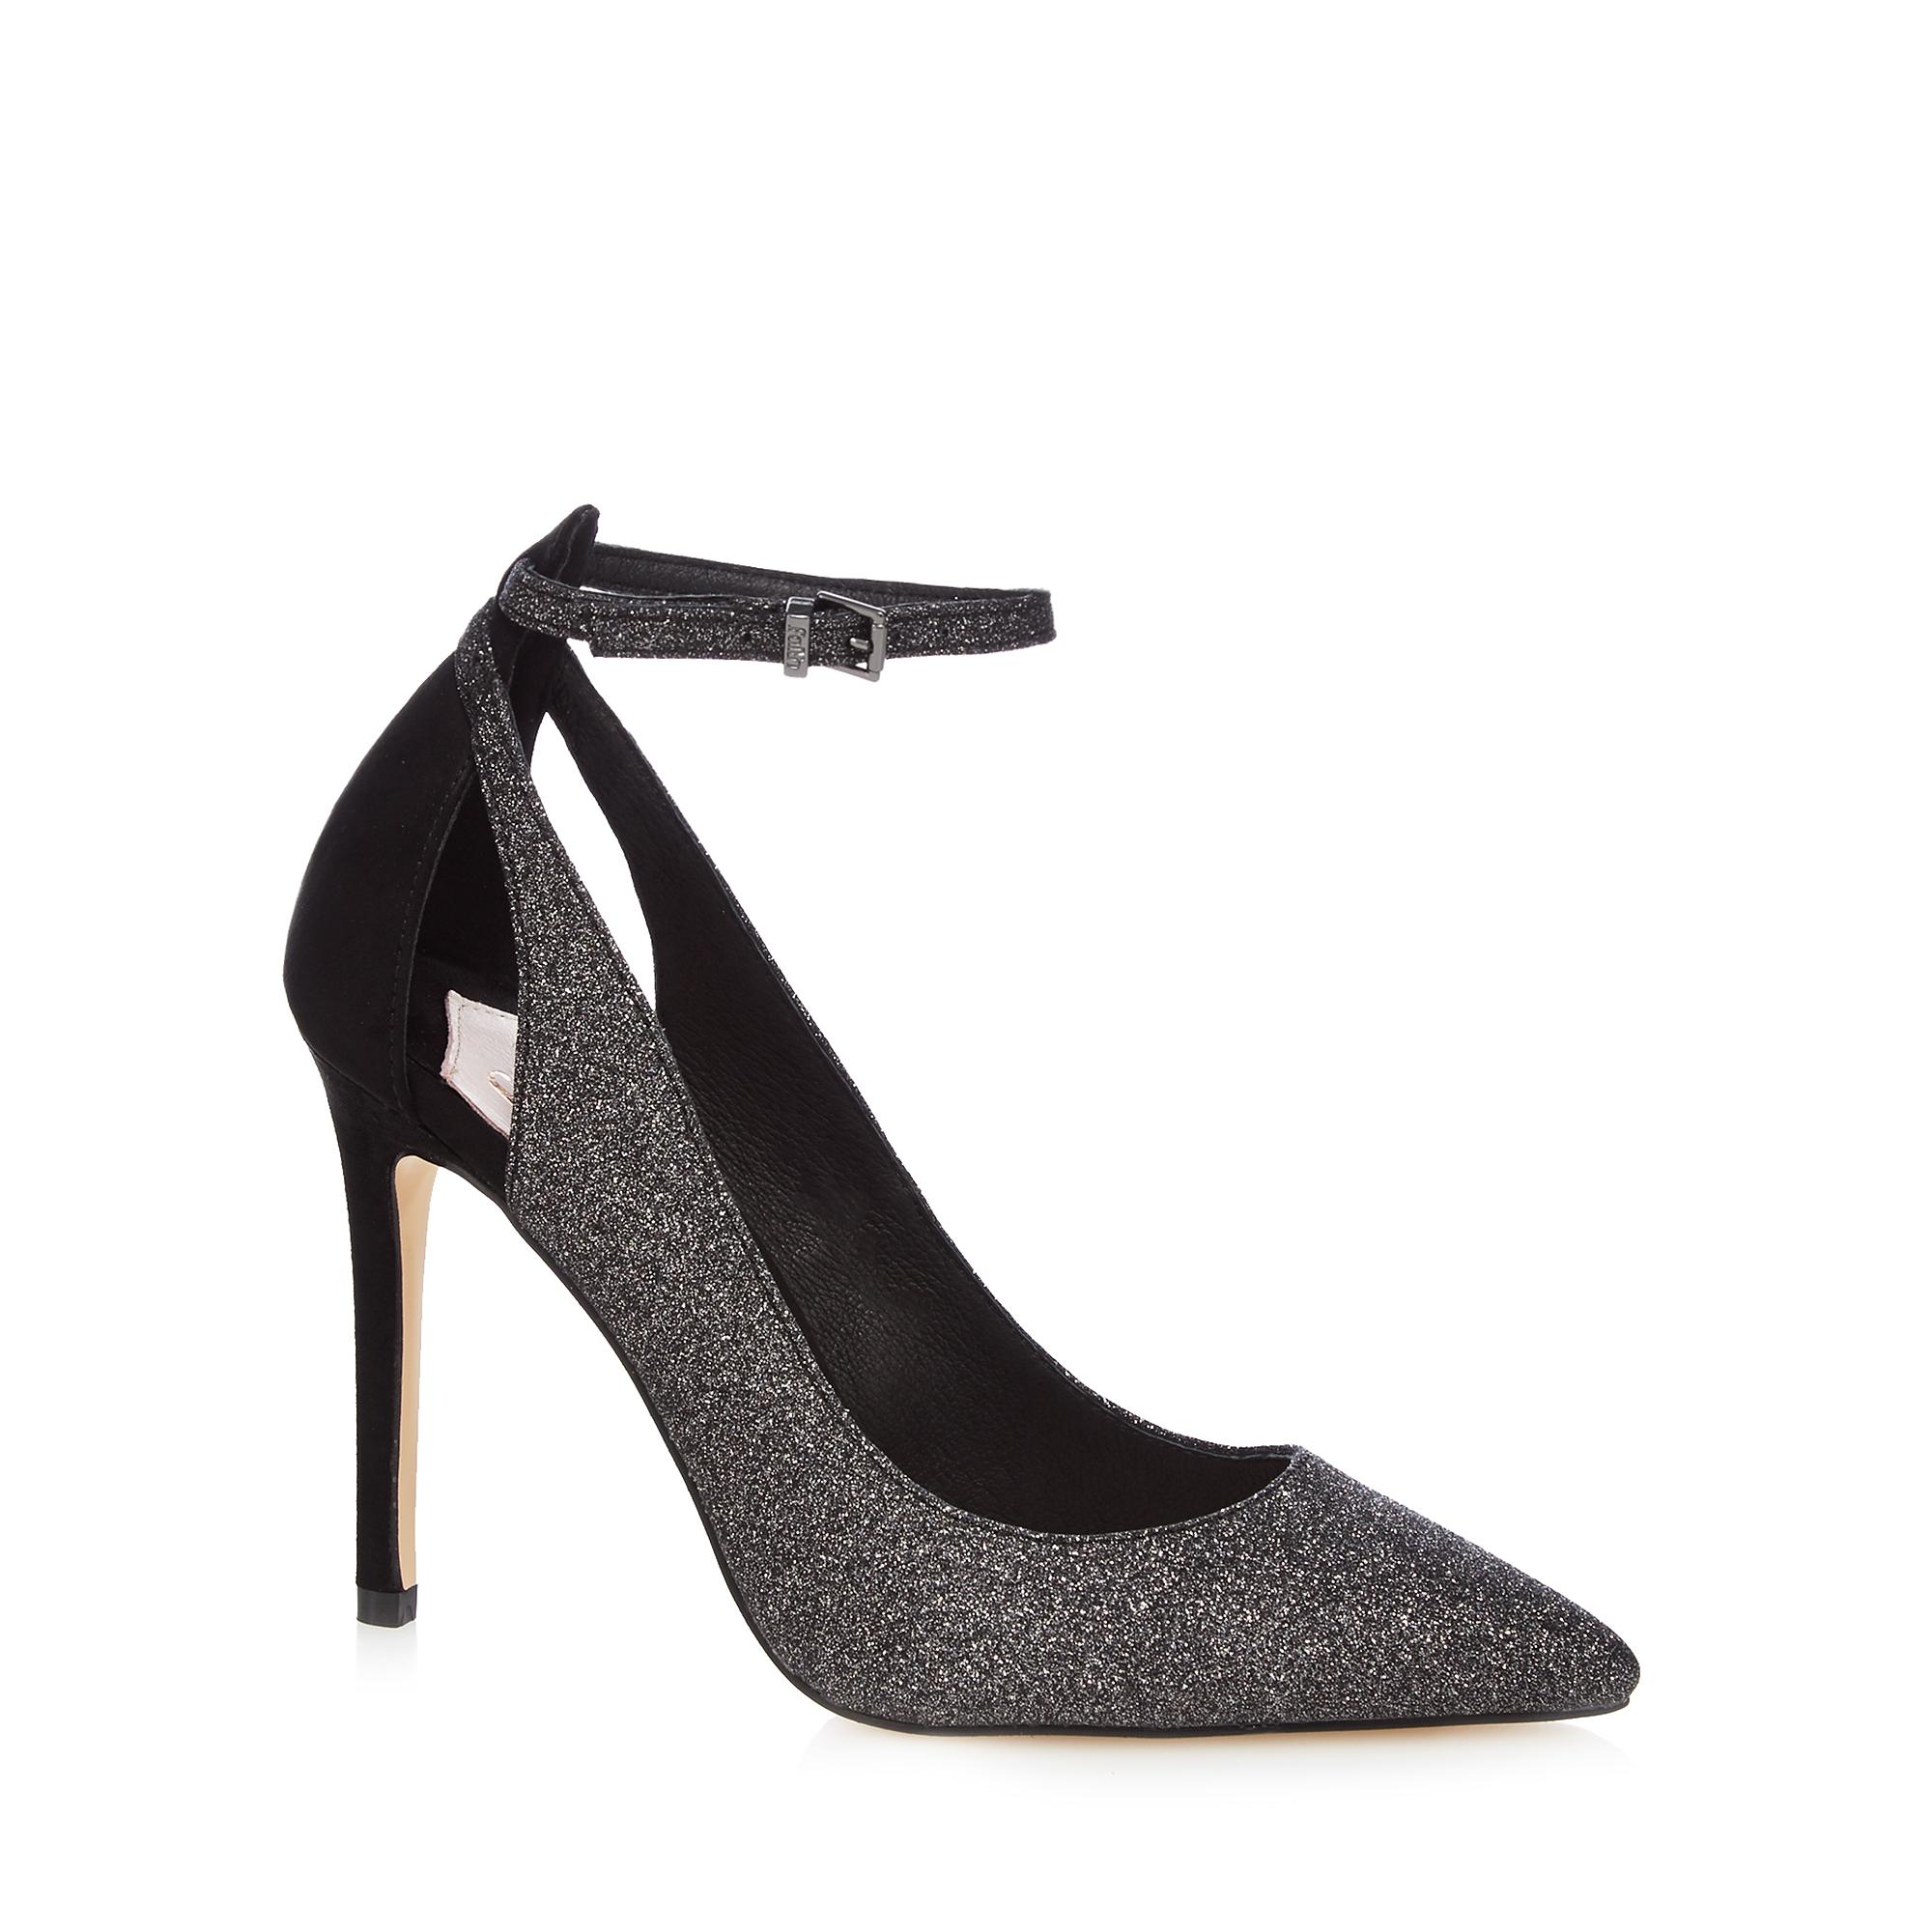 Black sandals debenhams - Party Shoes Evening Bags